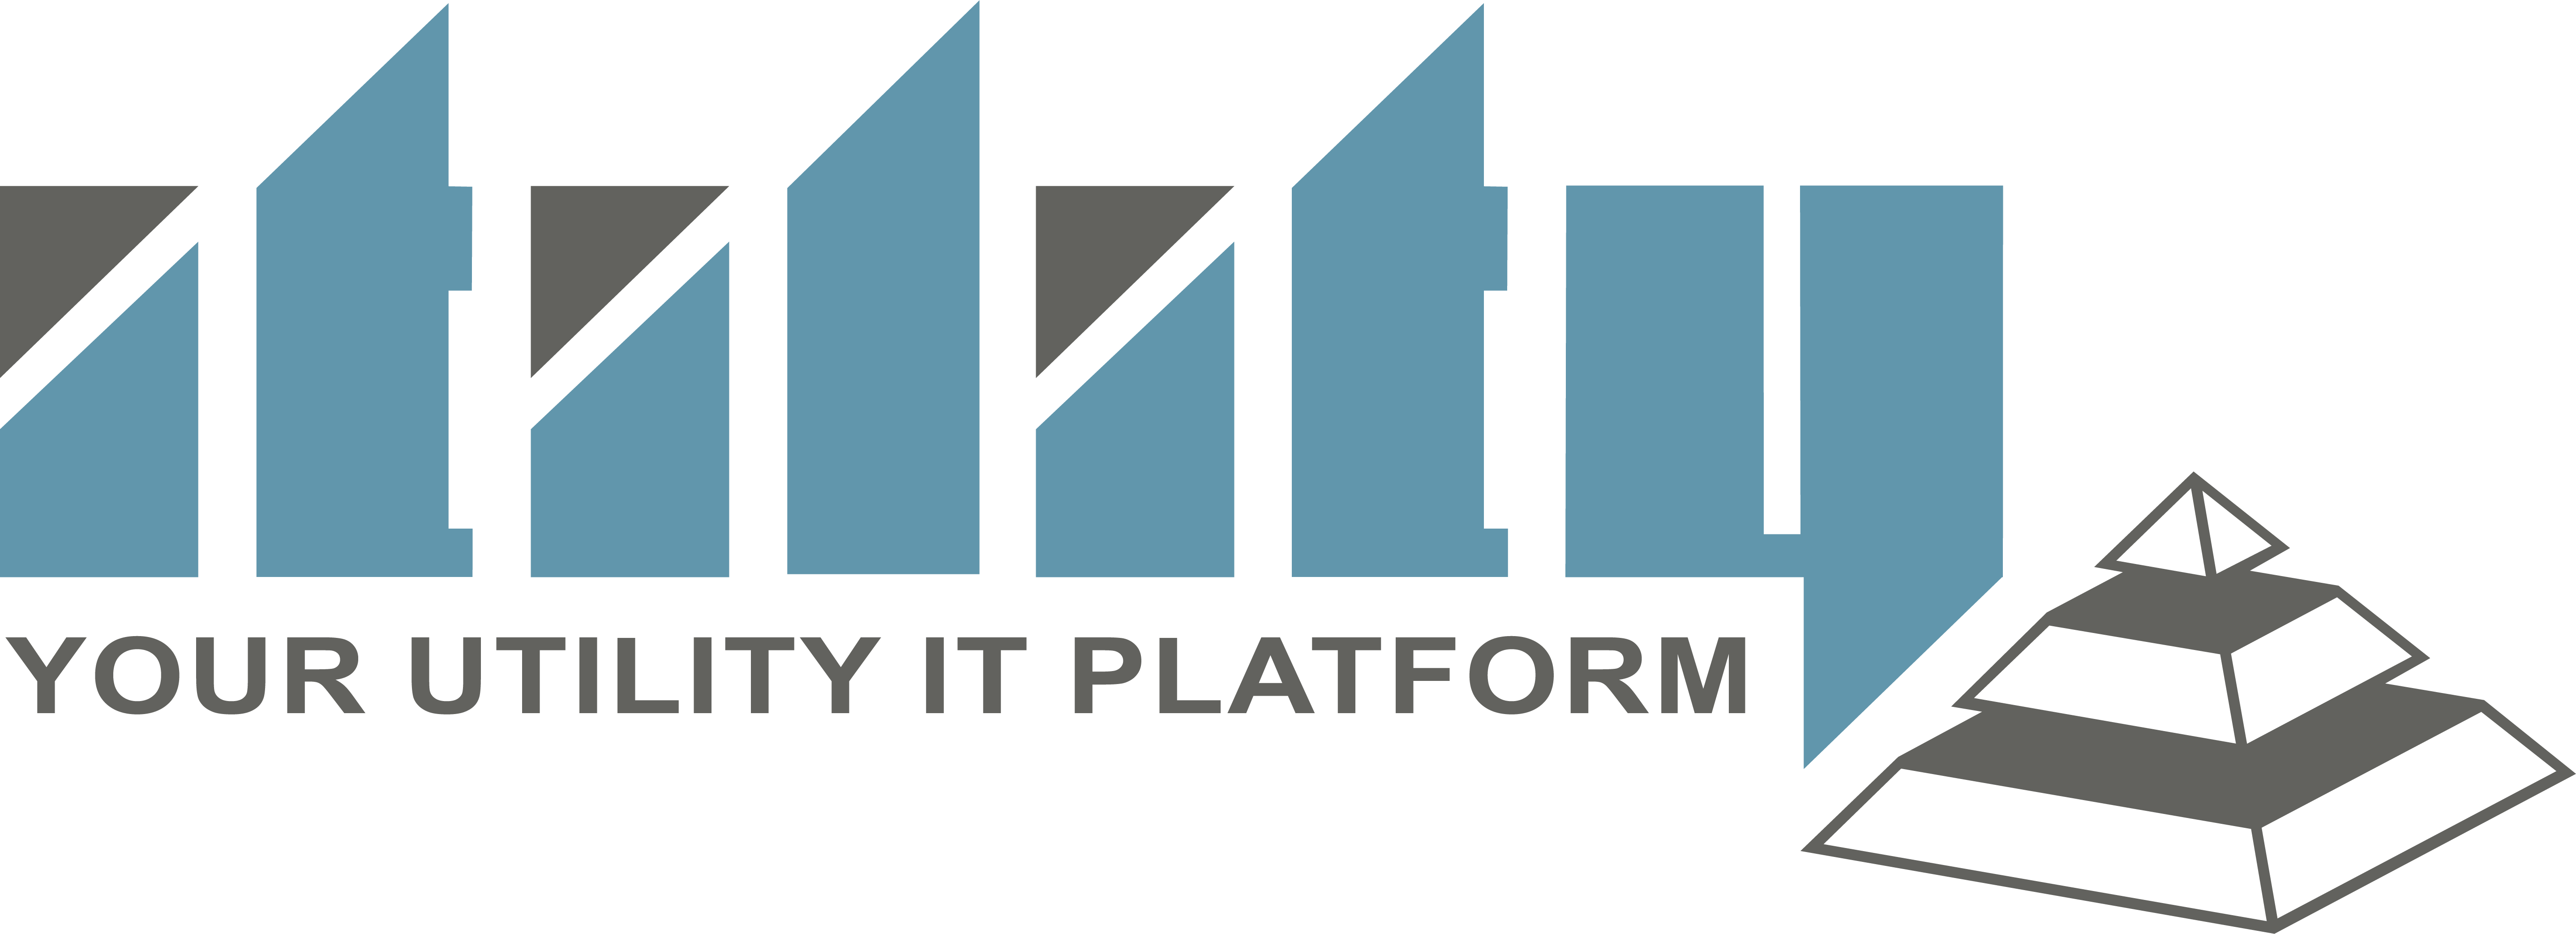 Itility - Your Utility IT platform